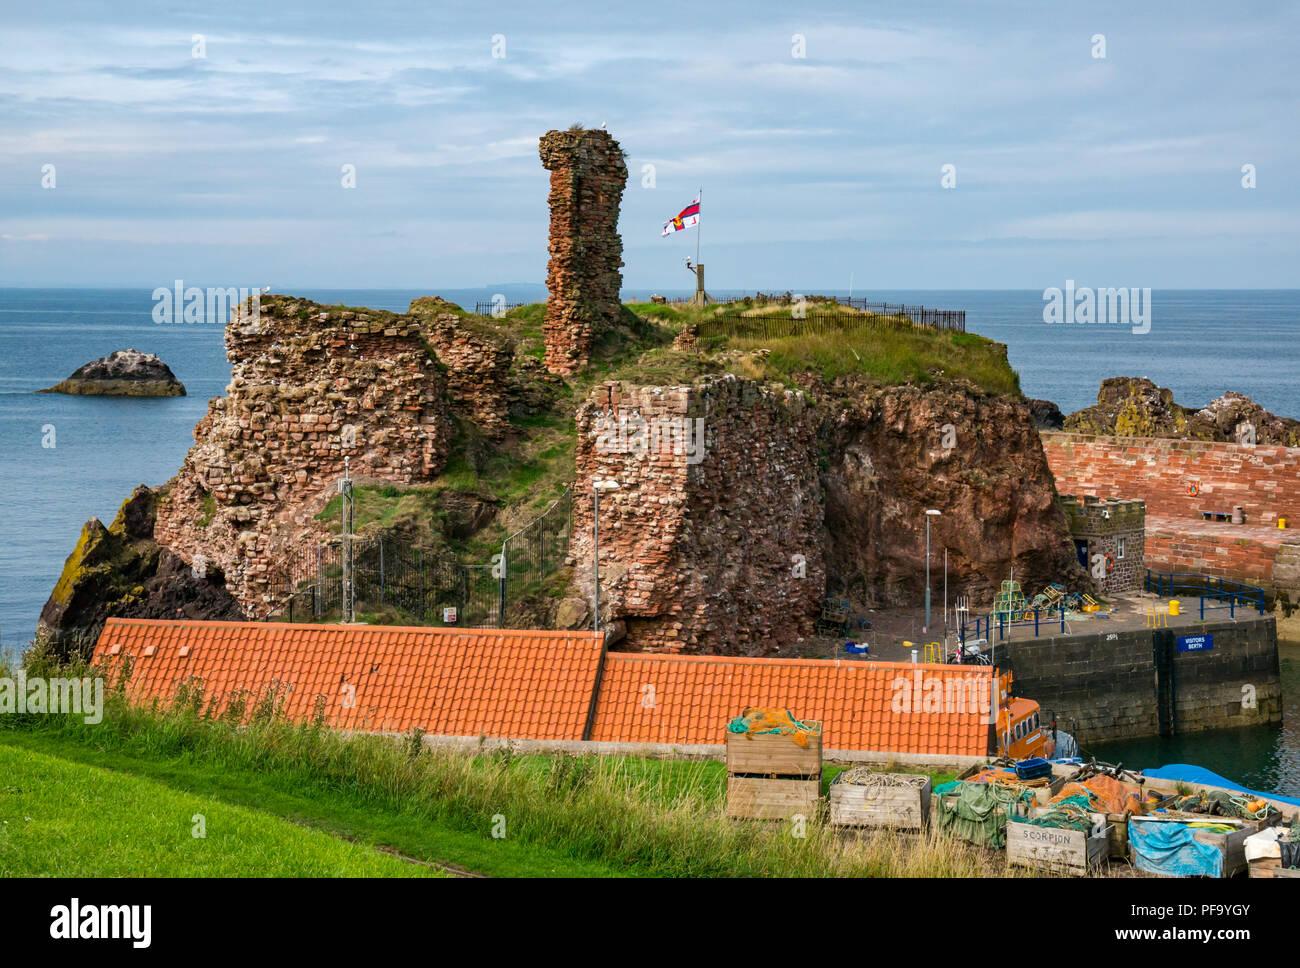 Ruined enceinte walls of Dunbar Castle with RNLI flag, Dunbar harbour, Dunbar, East Lothian, Scotland, UK - Stock Image